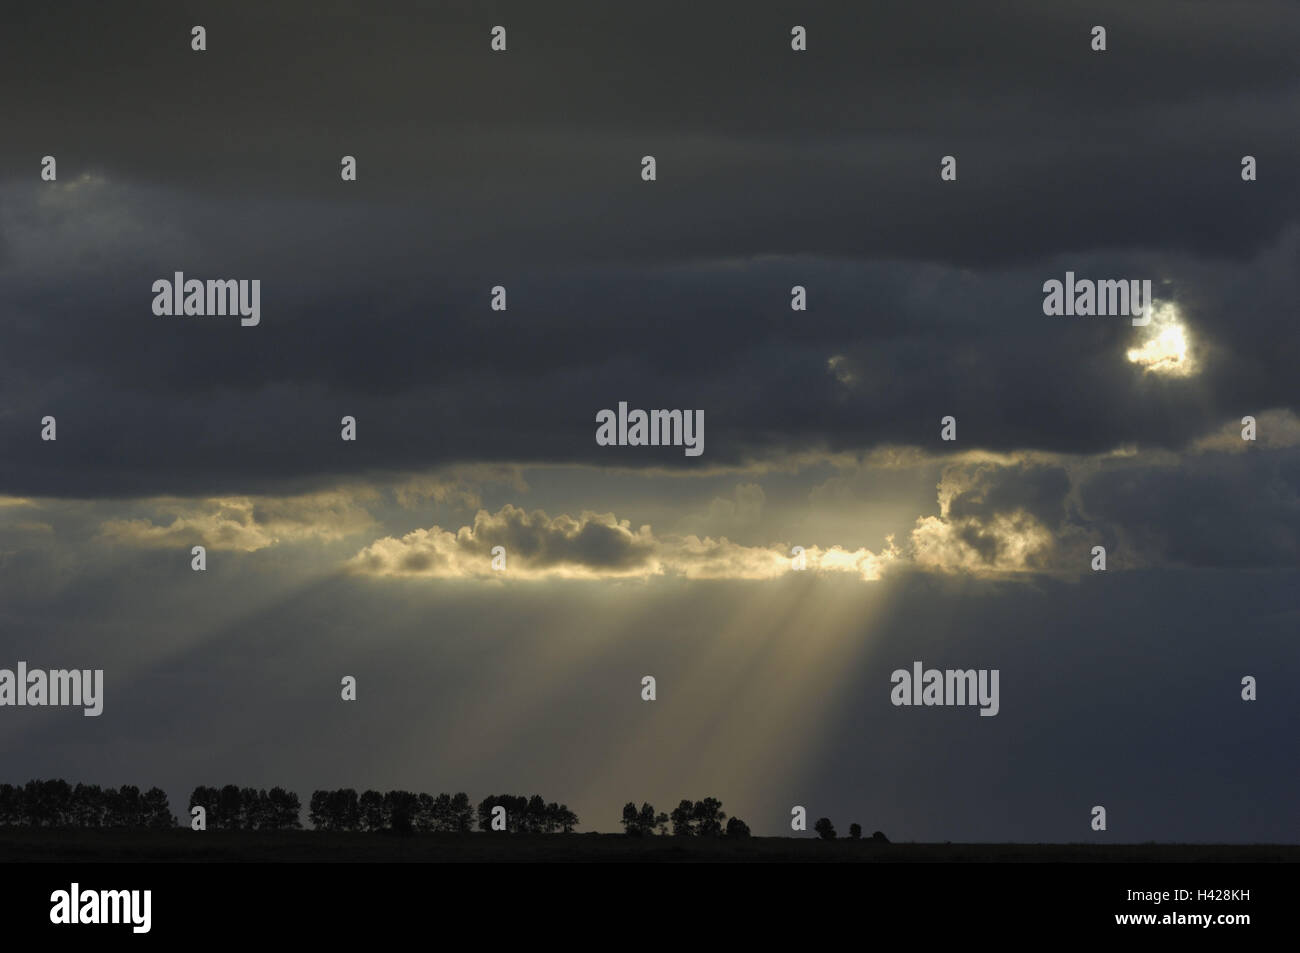 cloudy sky, darkly, rain clouds, sunrays, break through - Stock Image